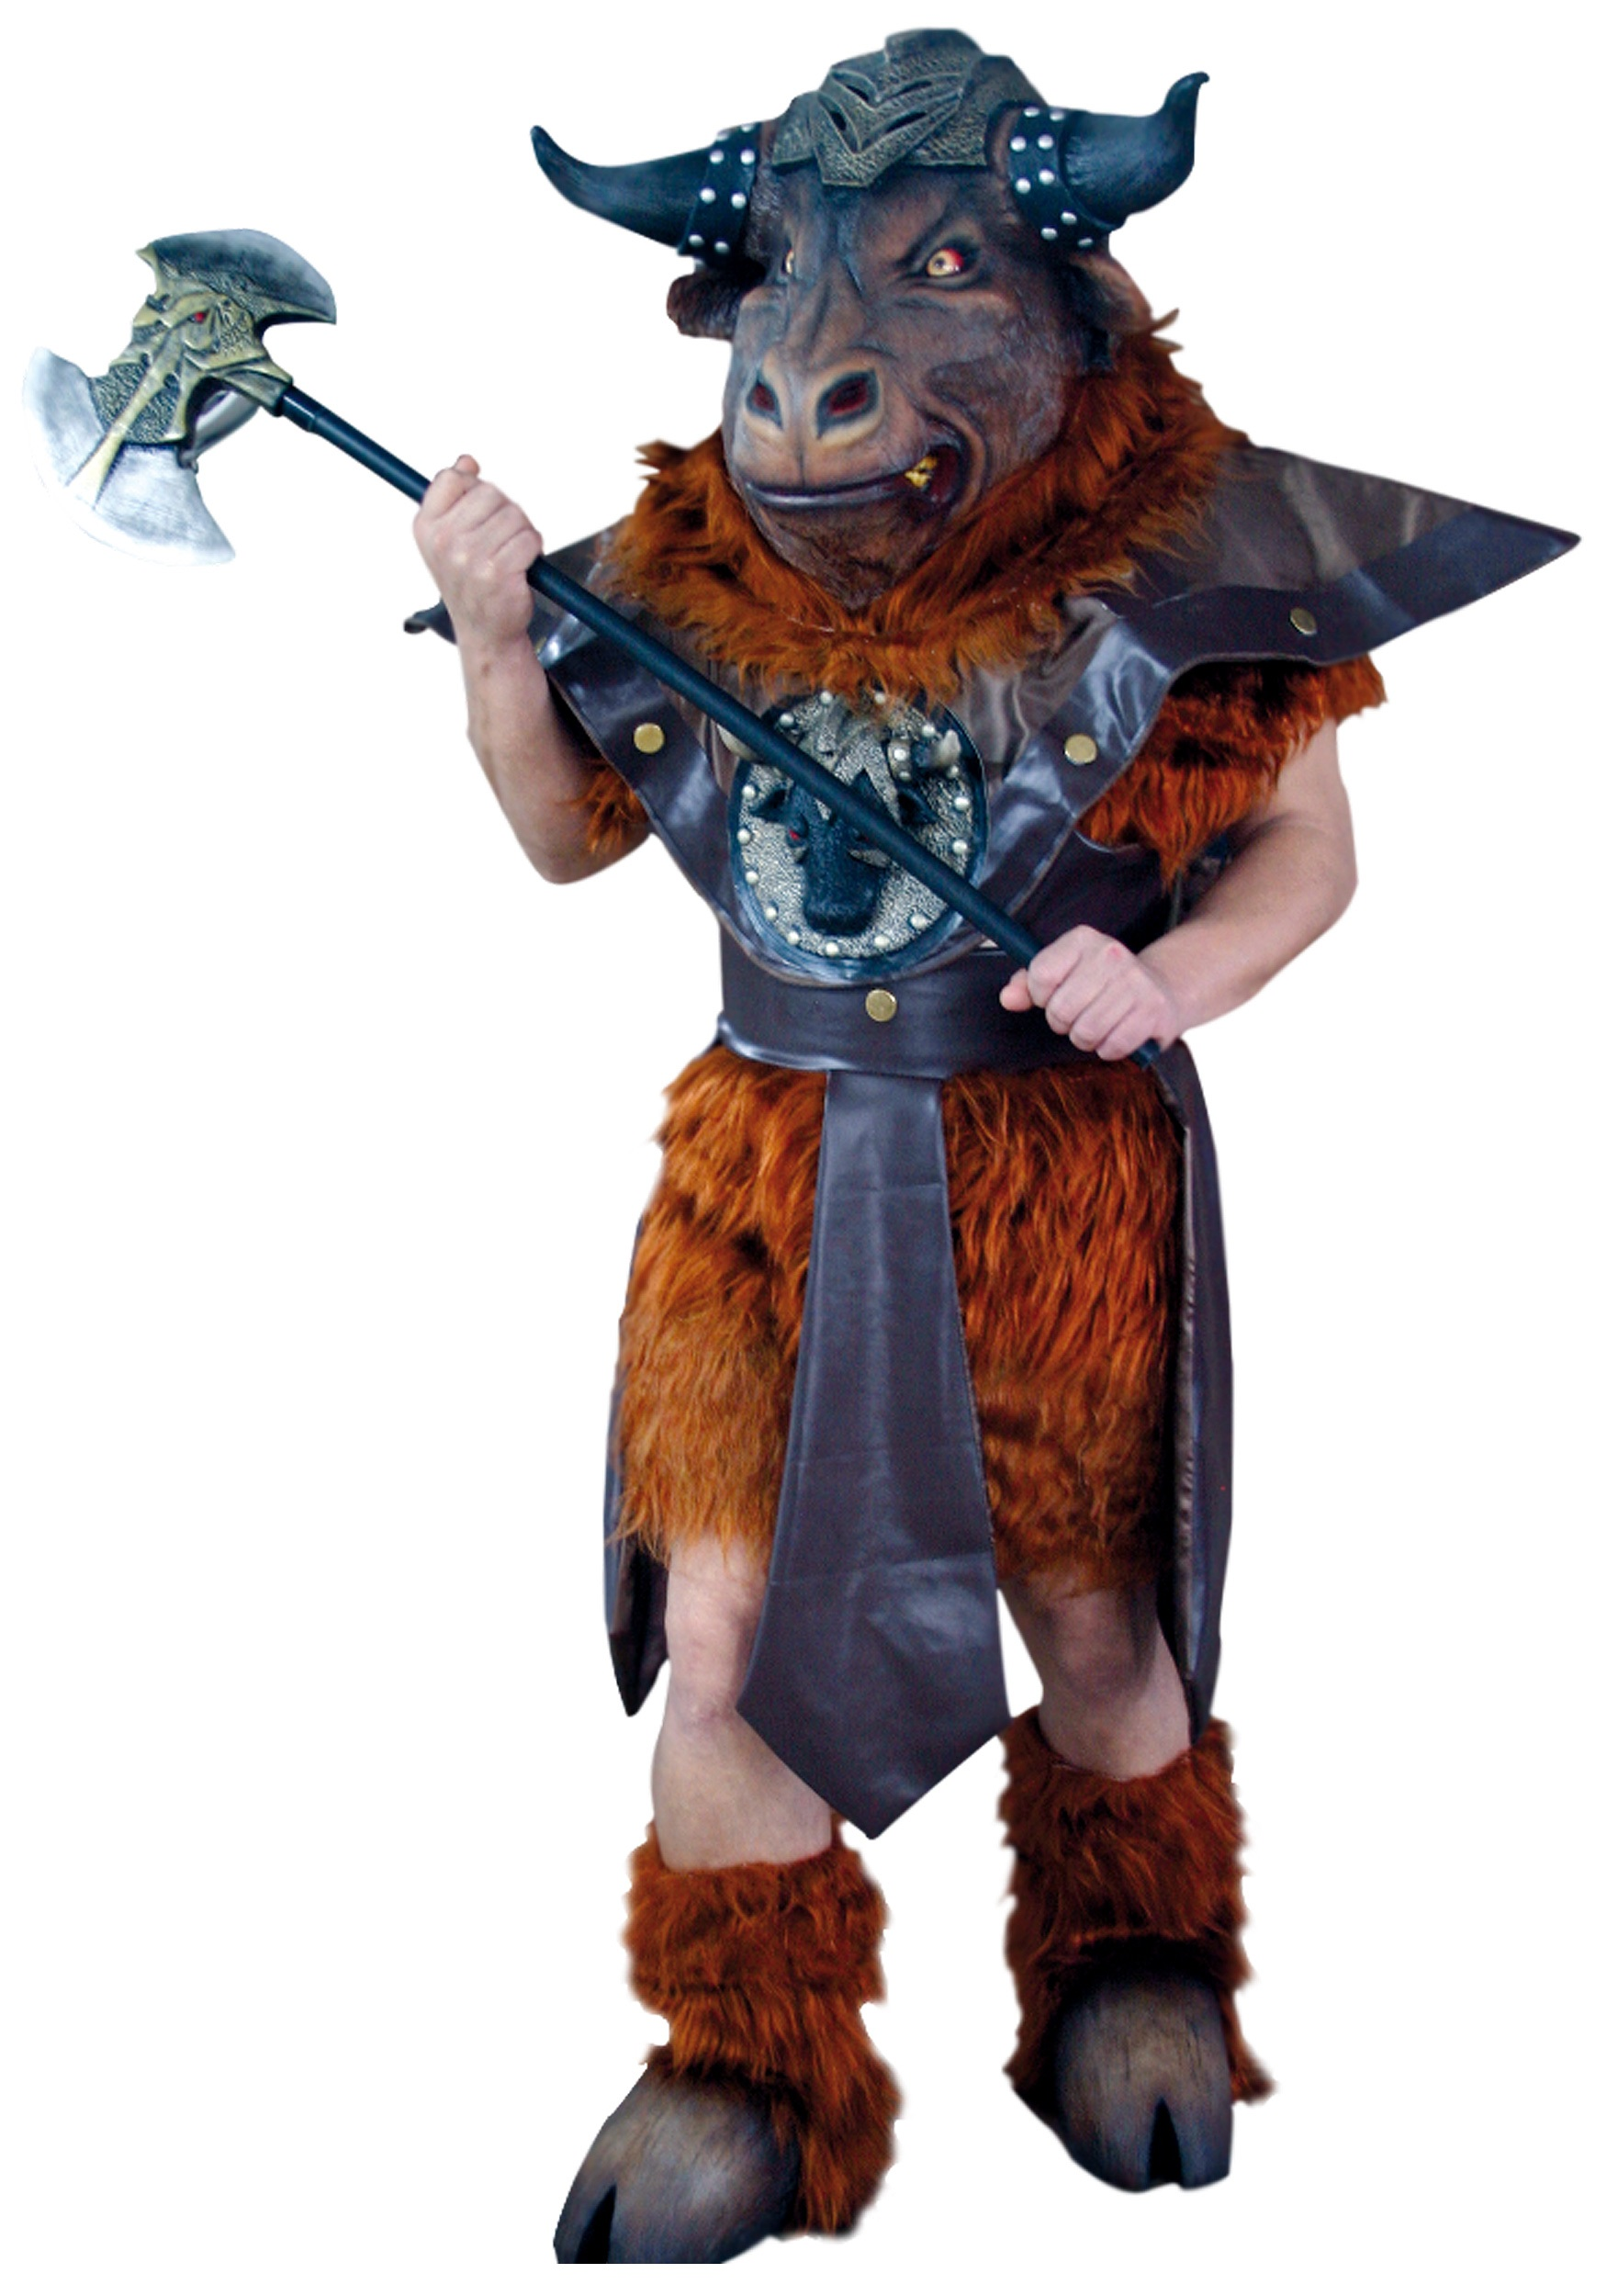 minotaur monster costume - scary beast halloween costumes